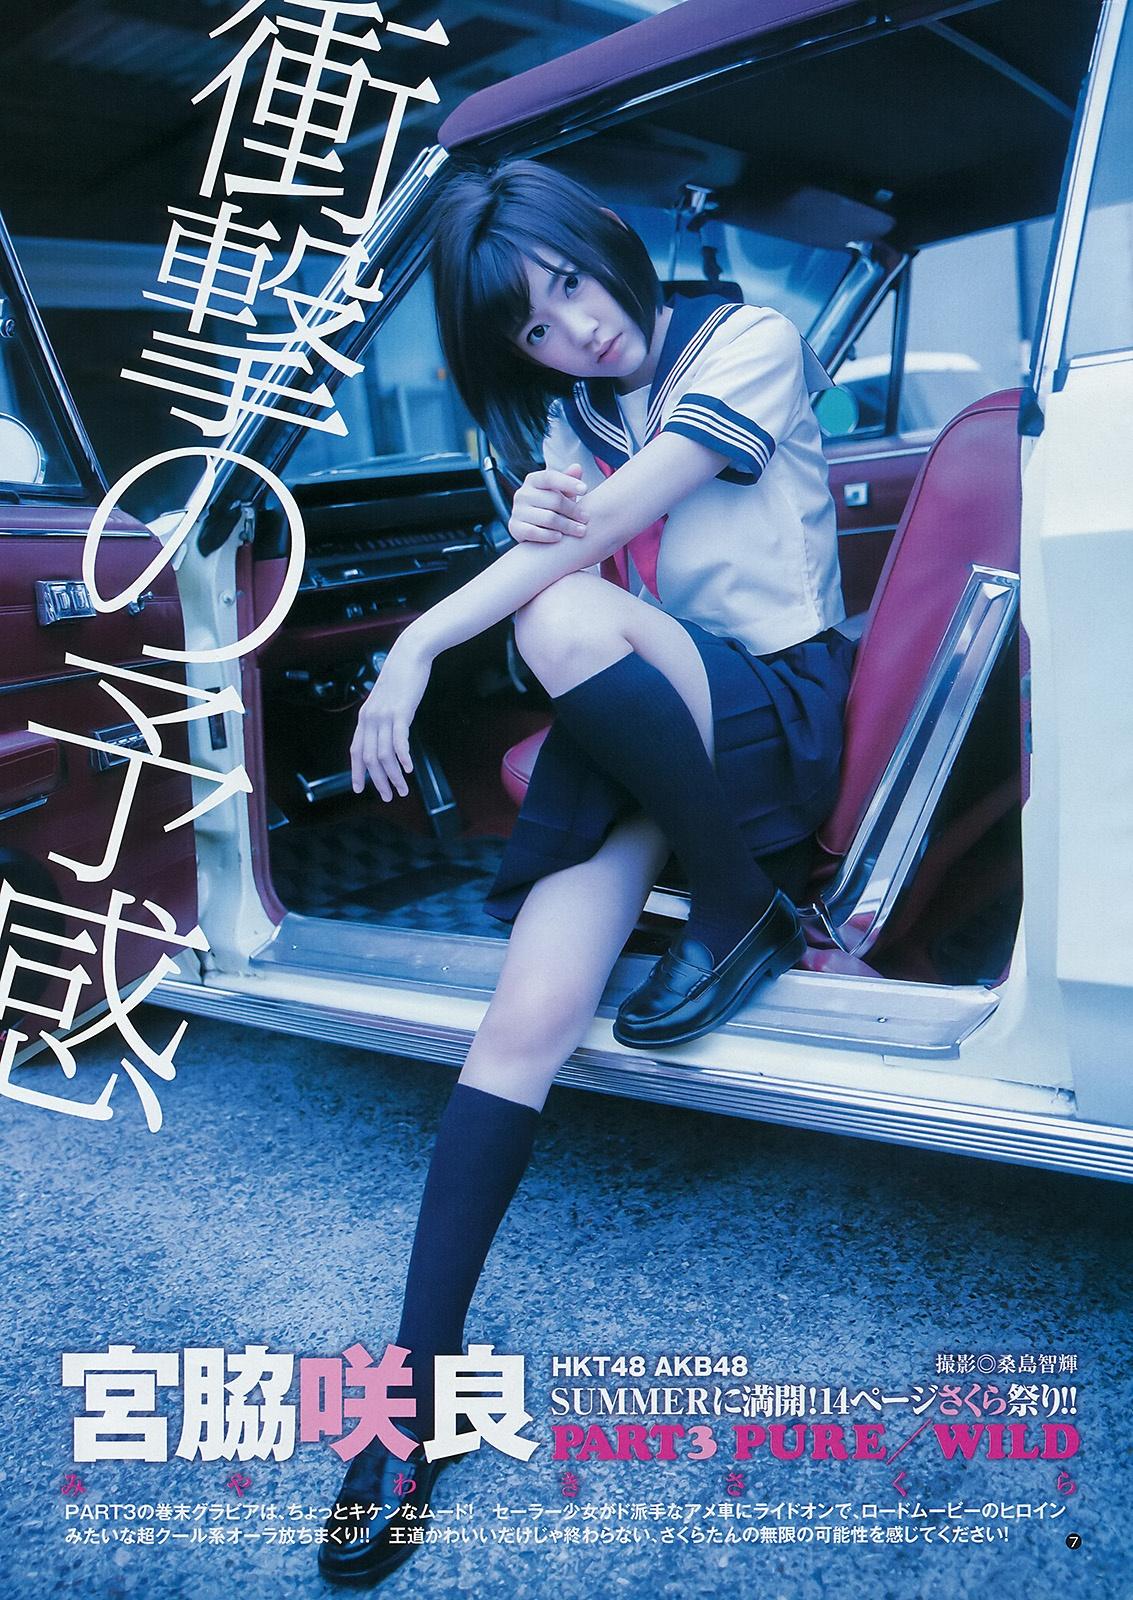 Miyawaki Sakura Android Iphone Wallpaper 1549 Asiachan Kpop Image